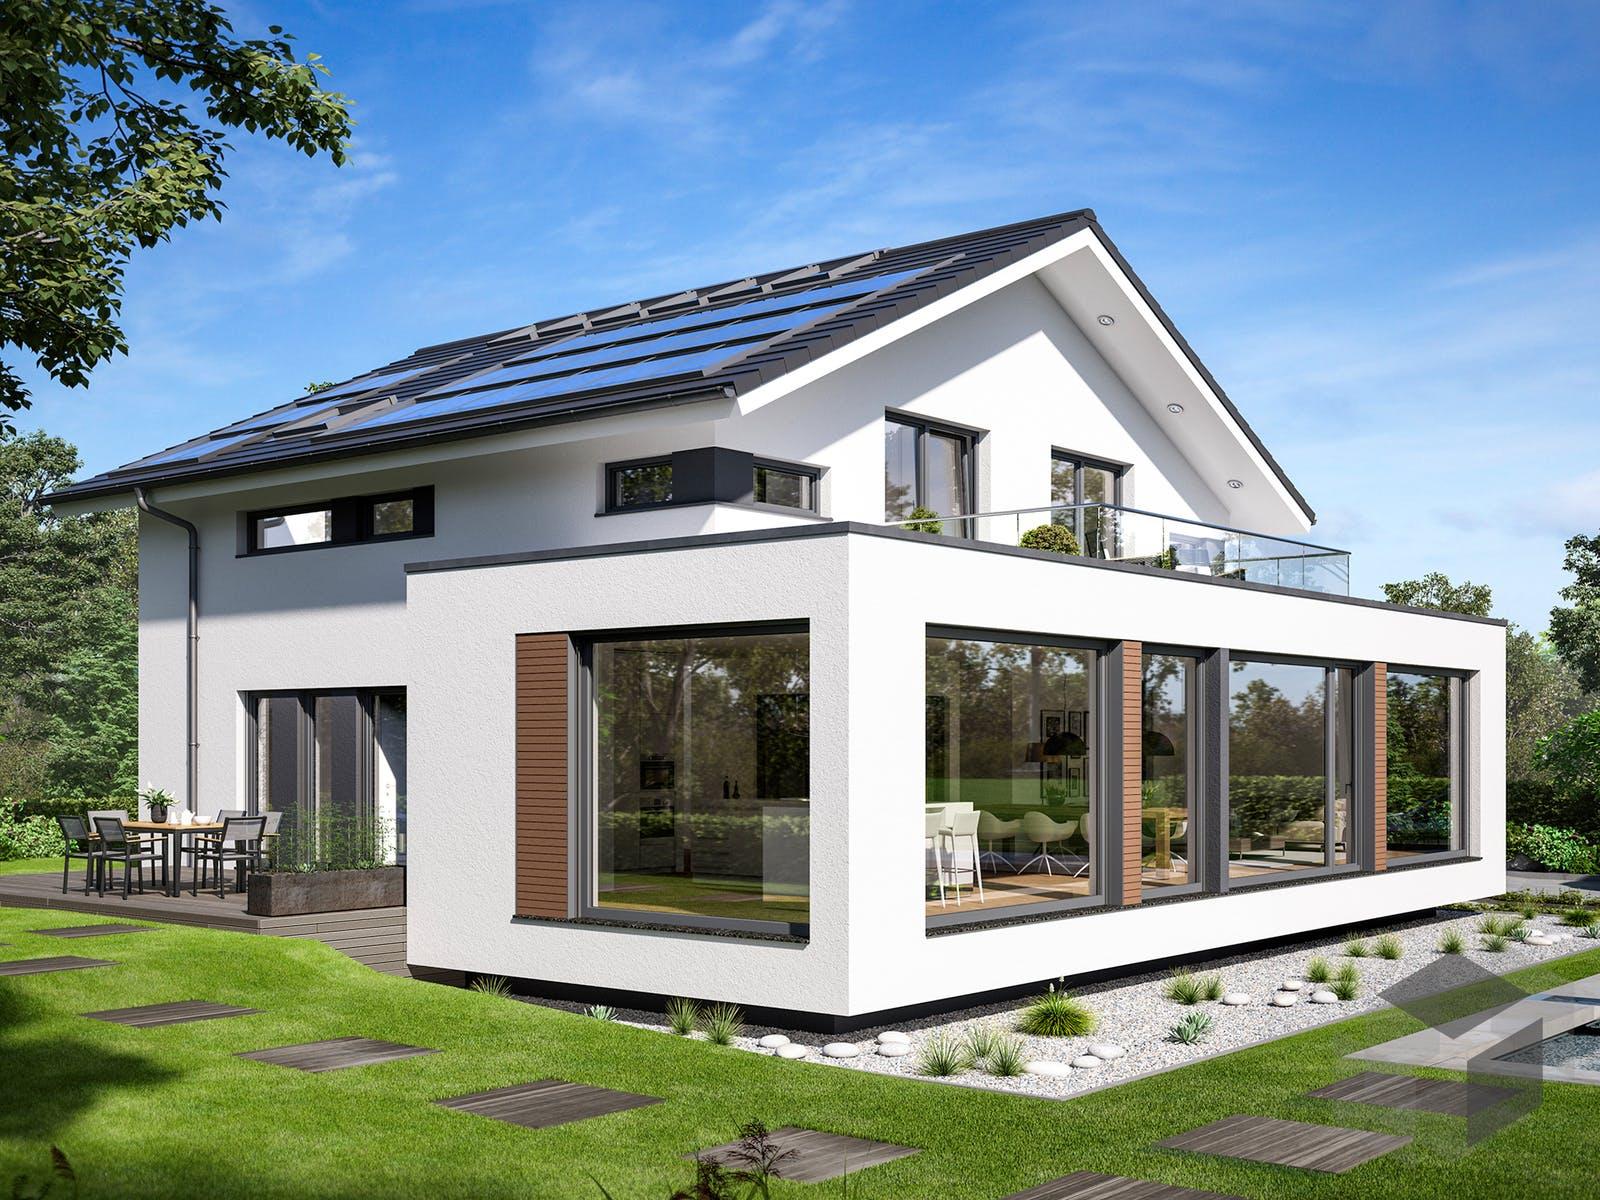 concept m 210 g nzburg von bien zenker komplette. Black Bedroom Furniture Sets. Home Design Ideas